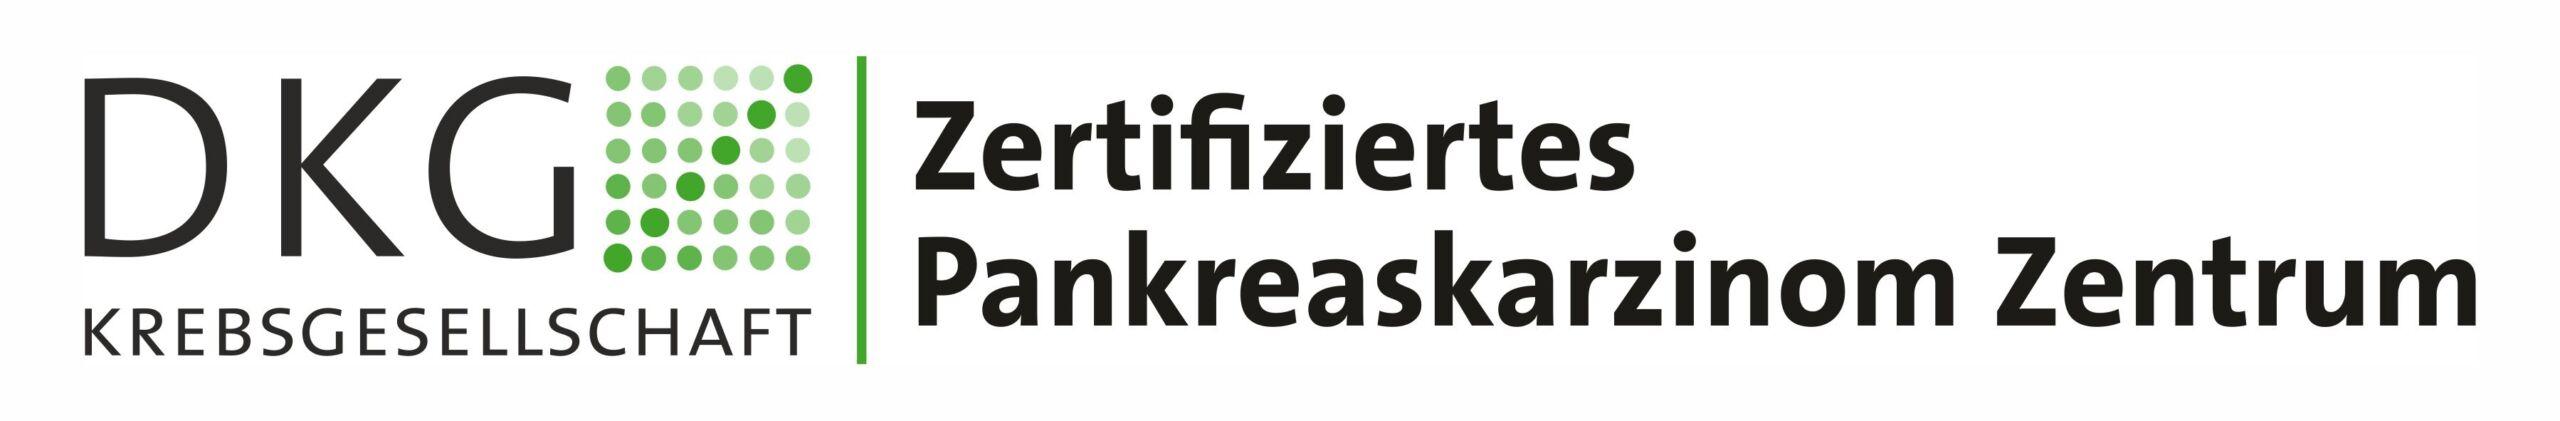 Dkg Pankreaskarzinom Zentrum Zertifikat